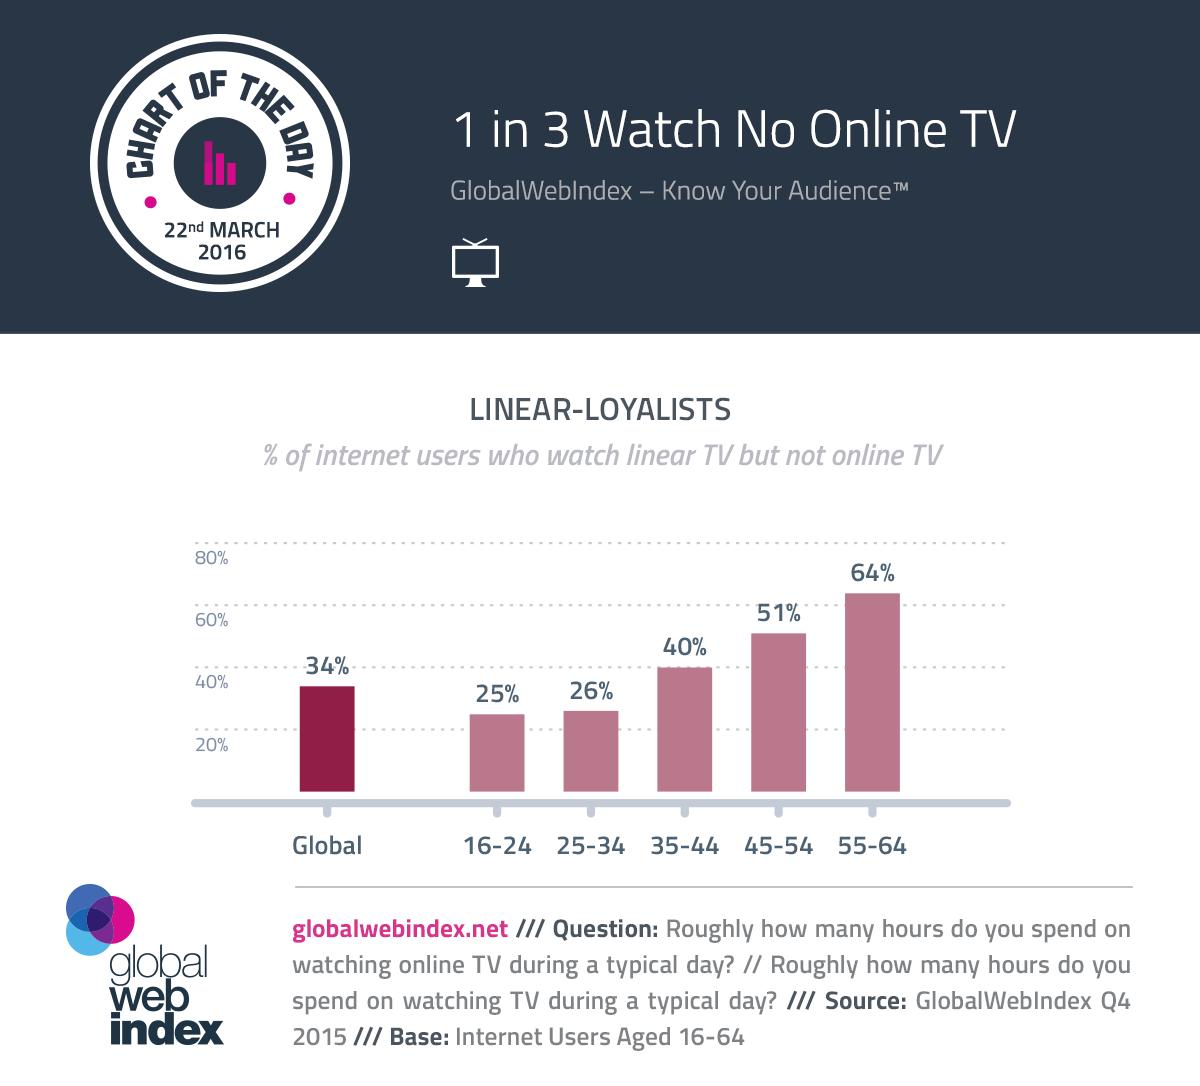 1 de cada 3 TV Mira Sin línea